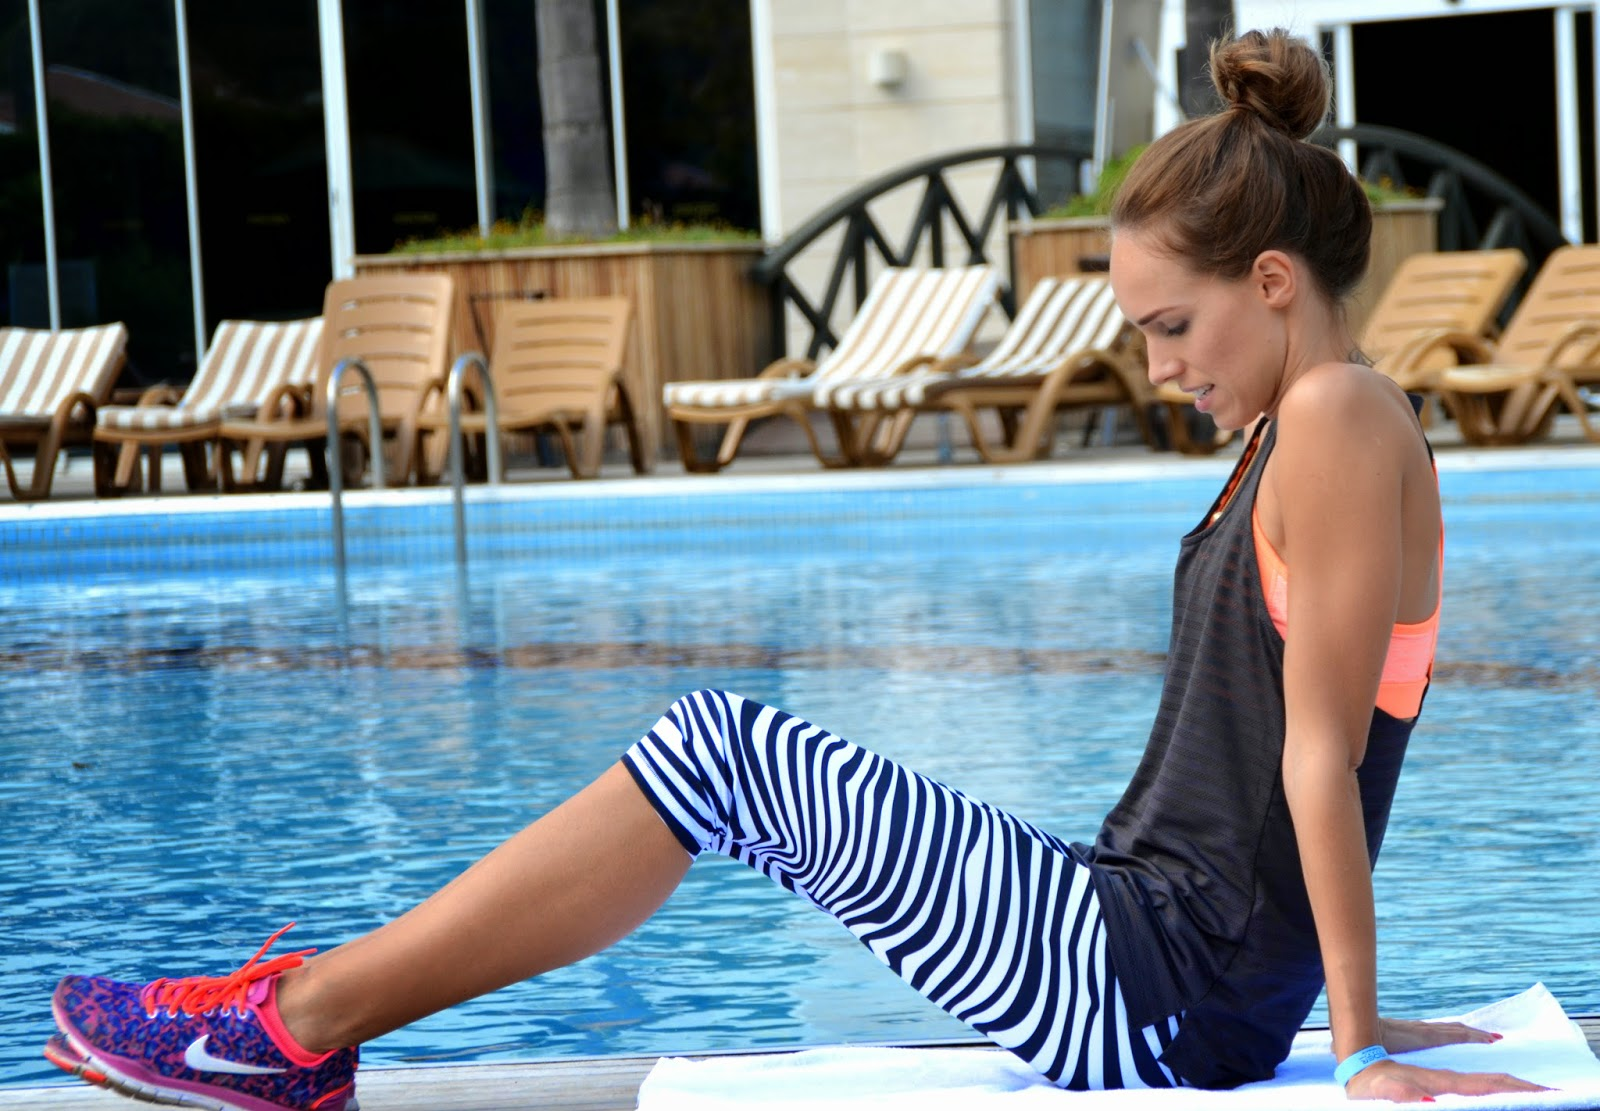 adidas-zebra-tights-hm-sports-bra-top-nike-free-5.0-geetah-pink kristjaana mere